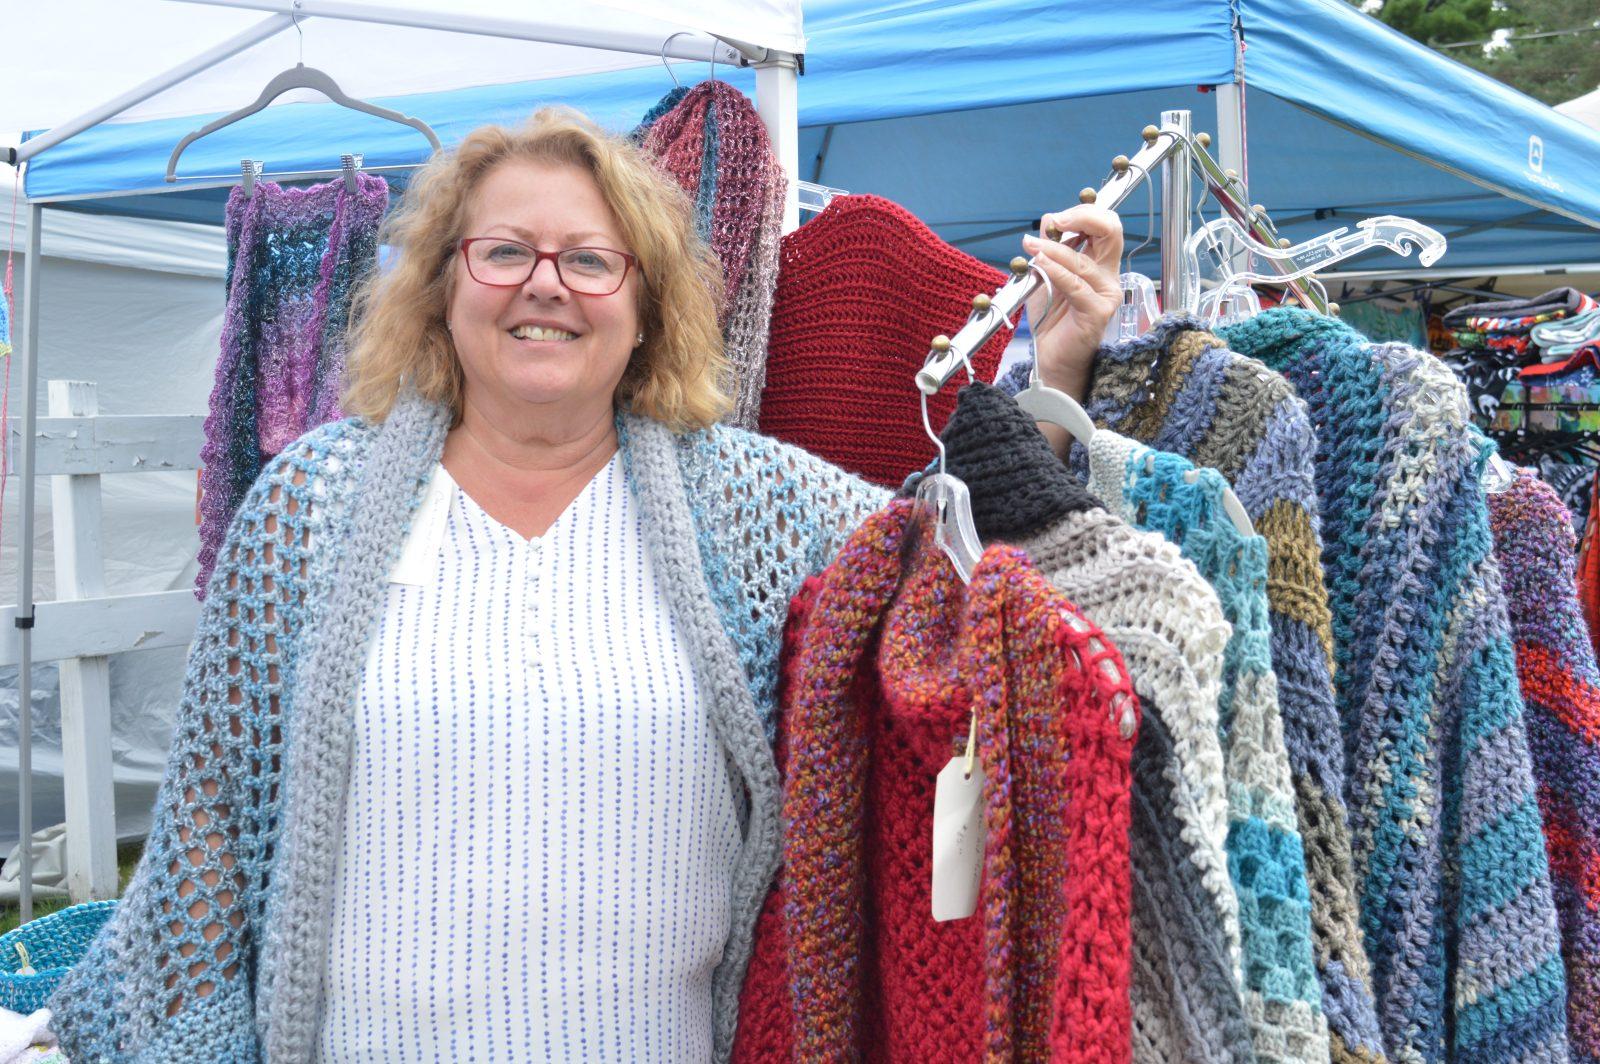 Williamstown Fall Harvest Festival sees 100 vendors